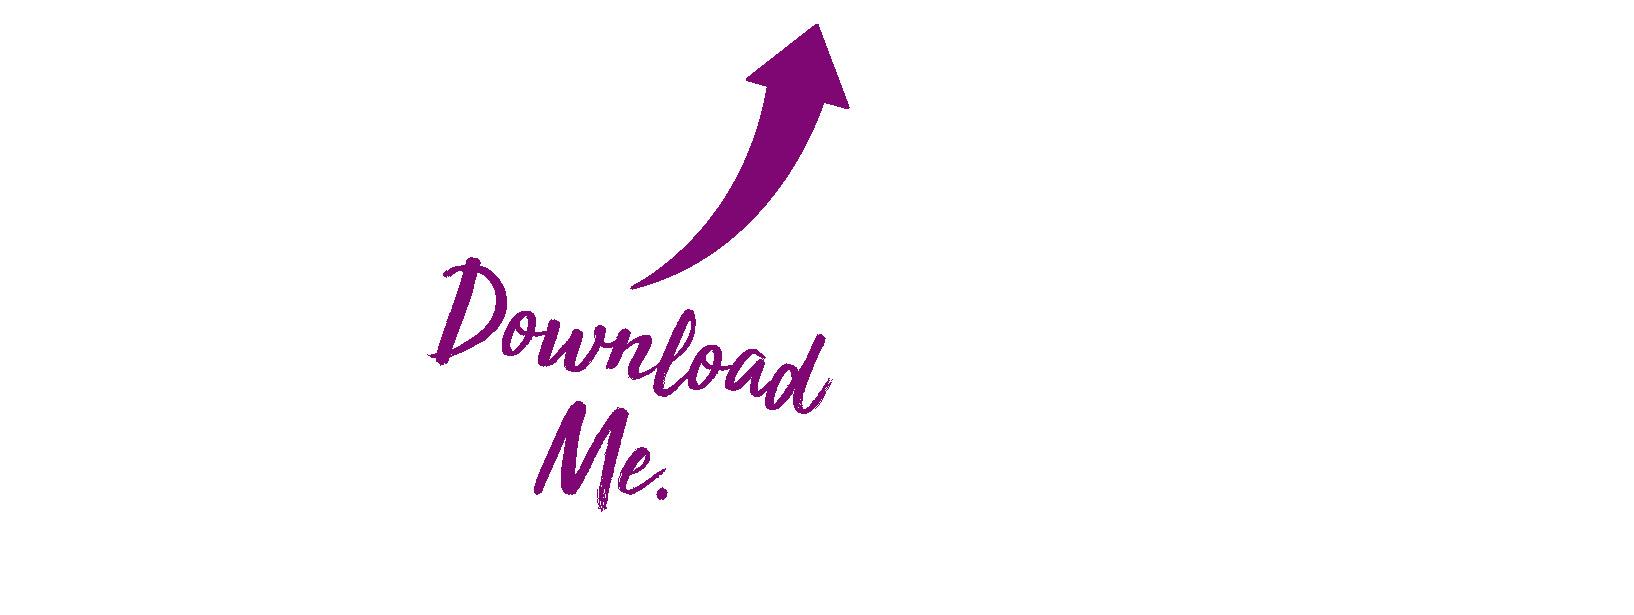 Download me.jpg